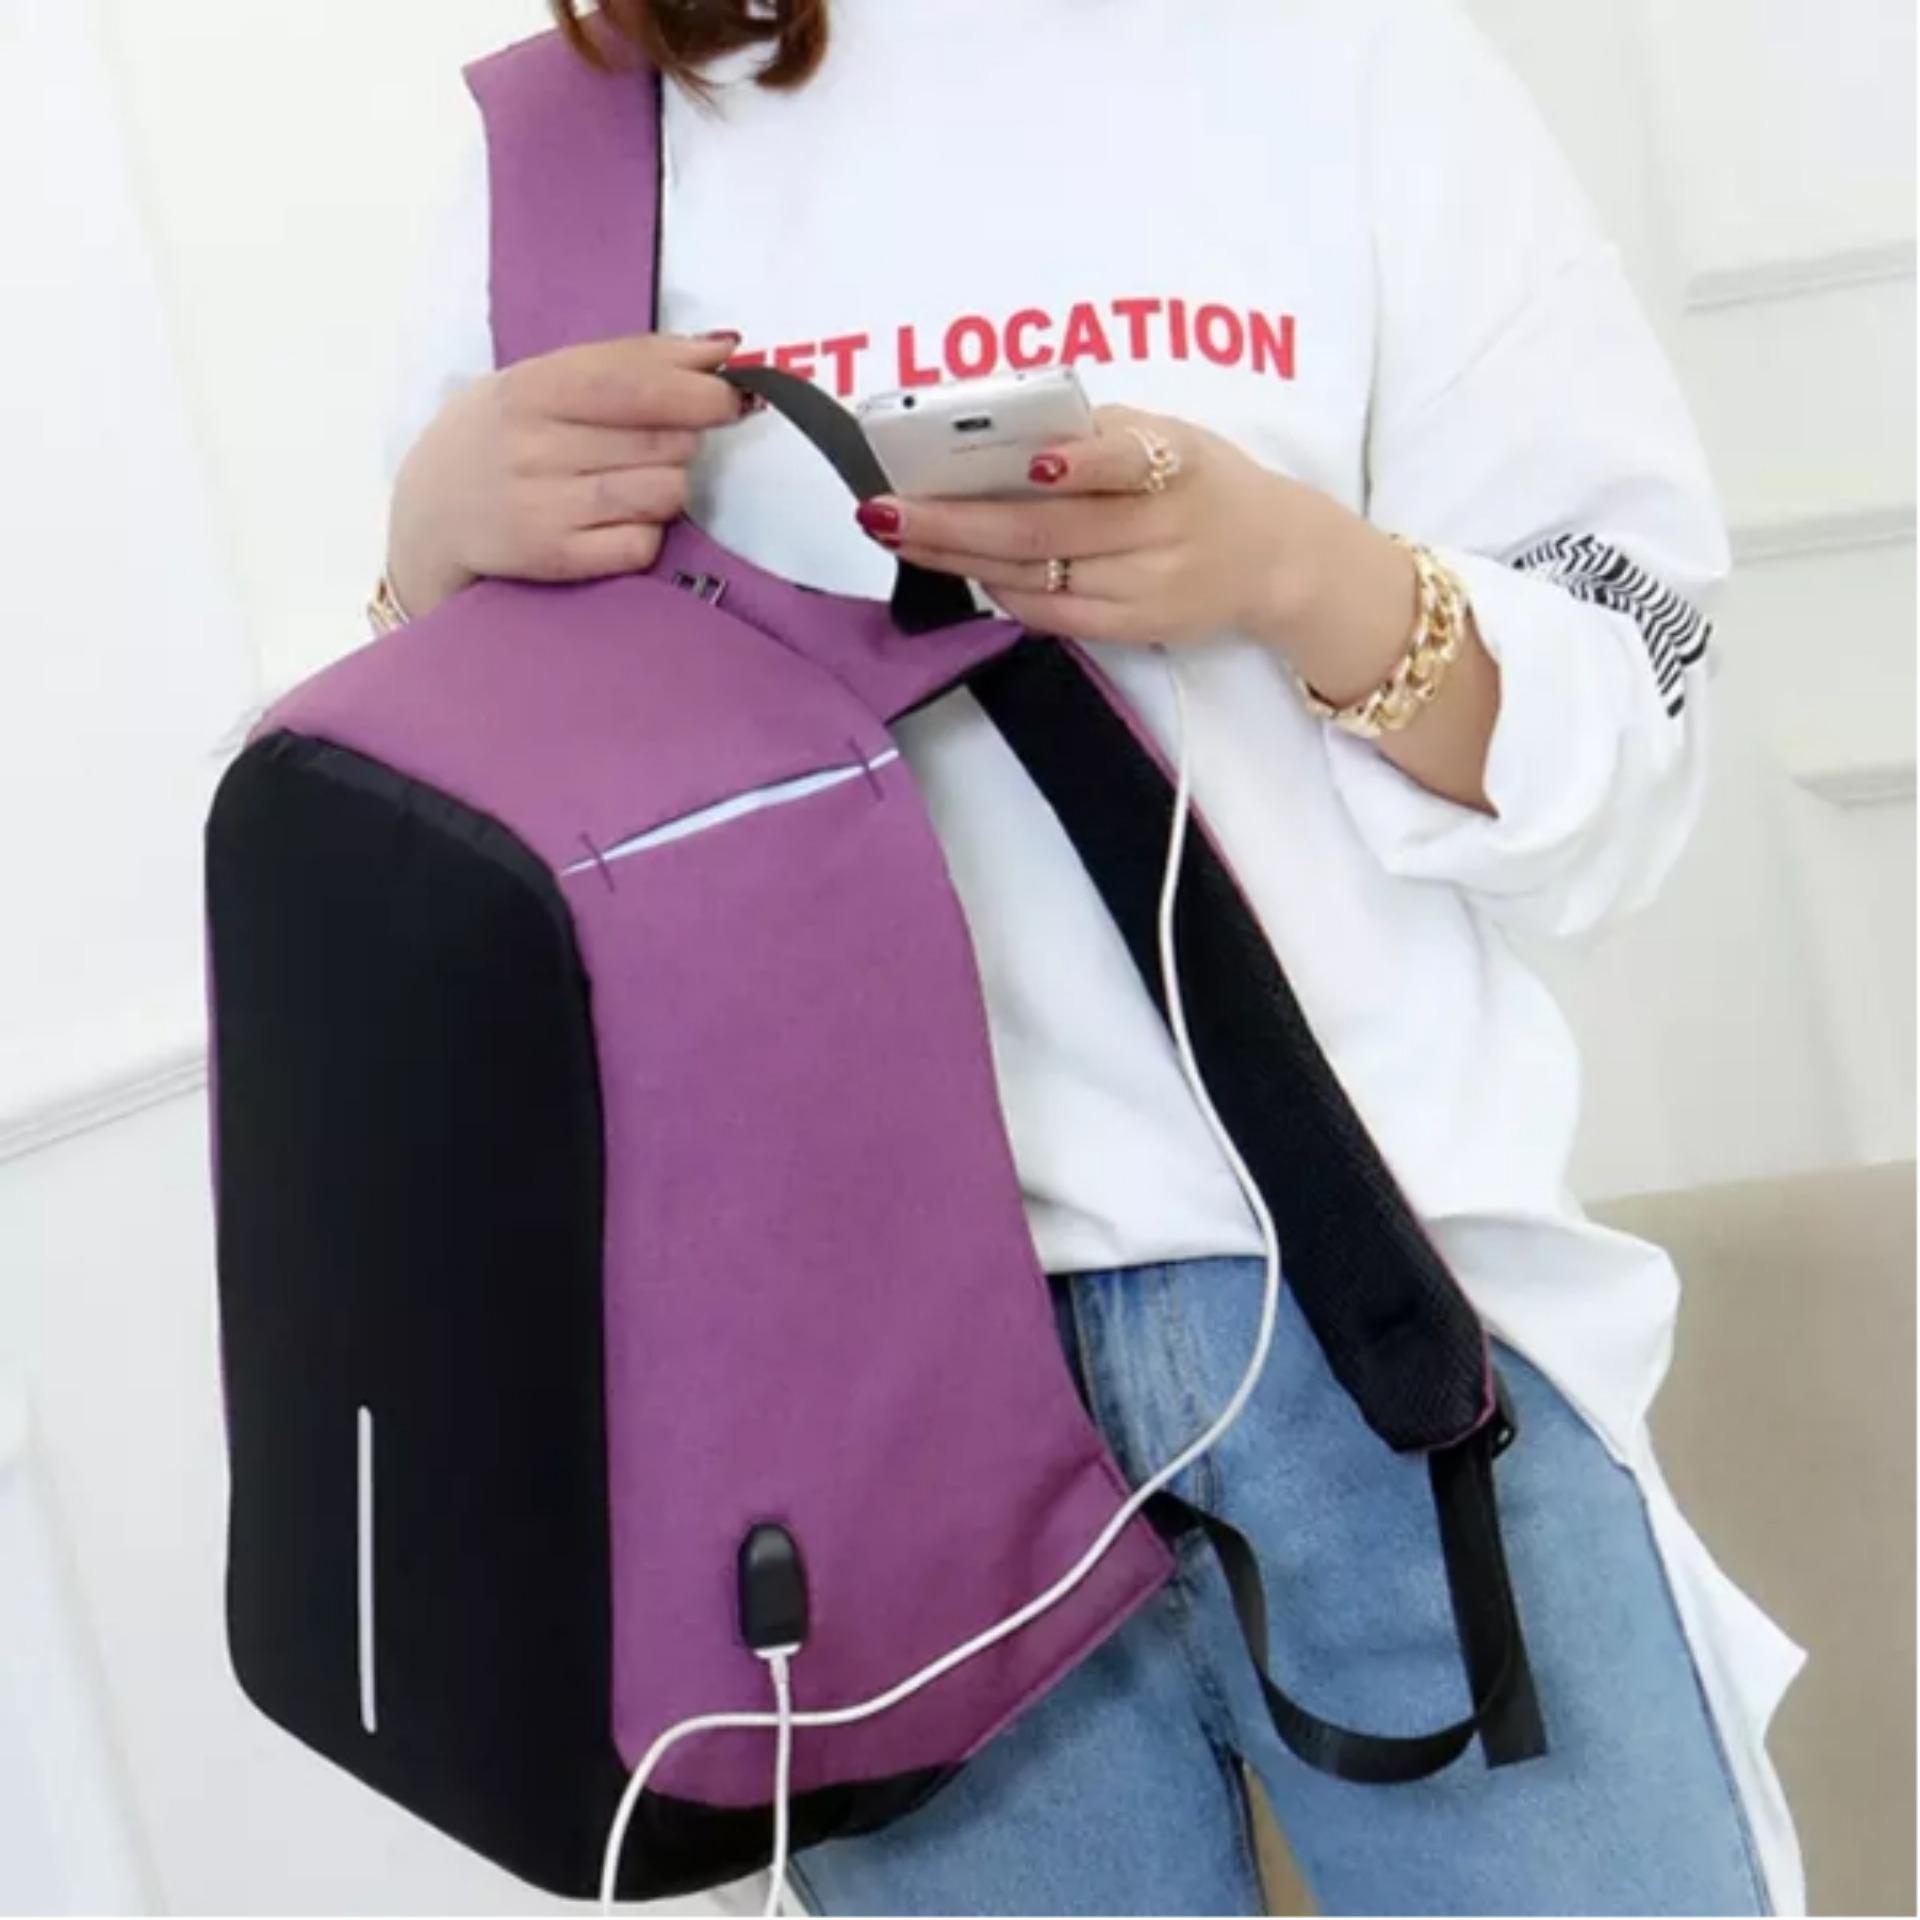 Harga Jual Tas Ransel Unisex Casual Anti Maling Dengan Charger Usb Uneed Capsule Smart Backpack Ub104 Black